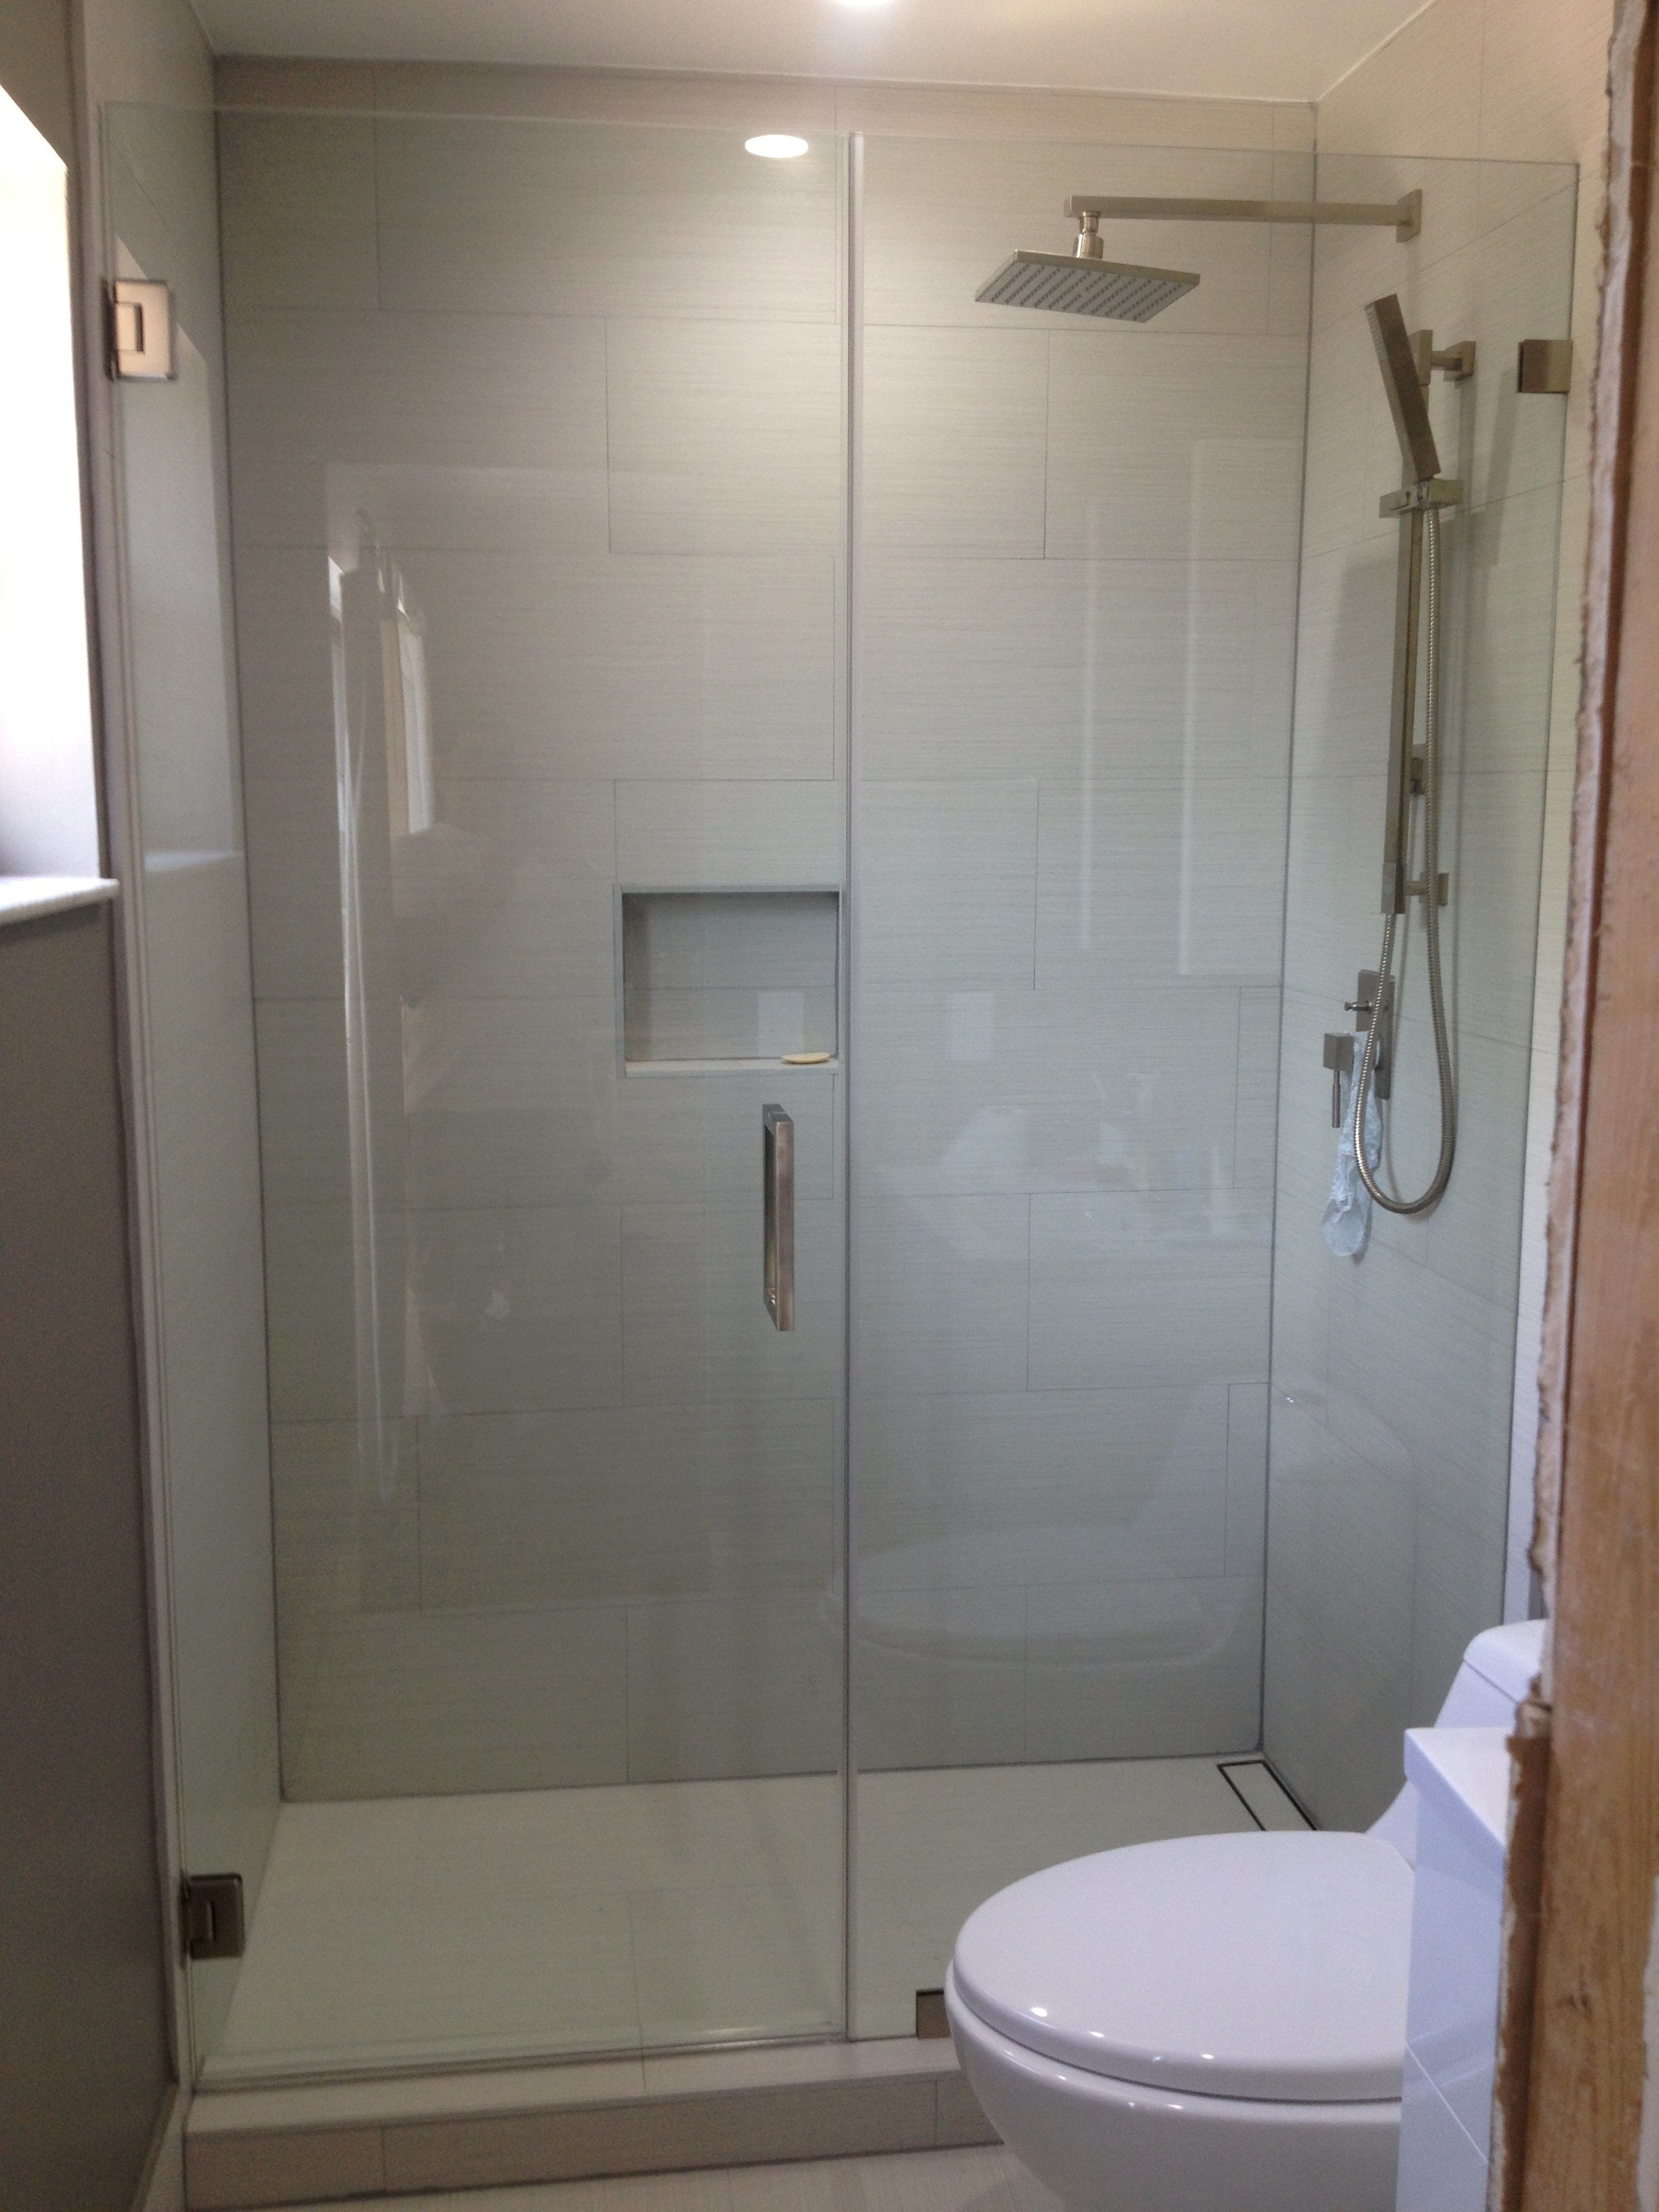 bathroom glass doors miami | house | Pinterest | Shower ...